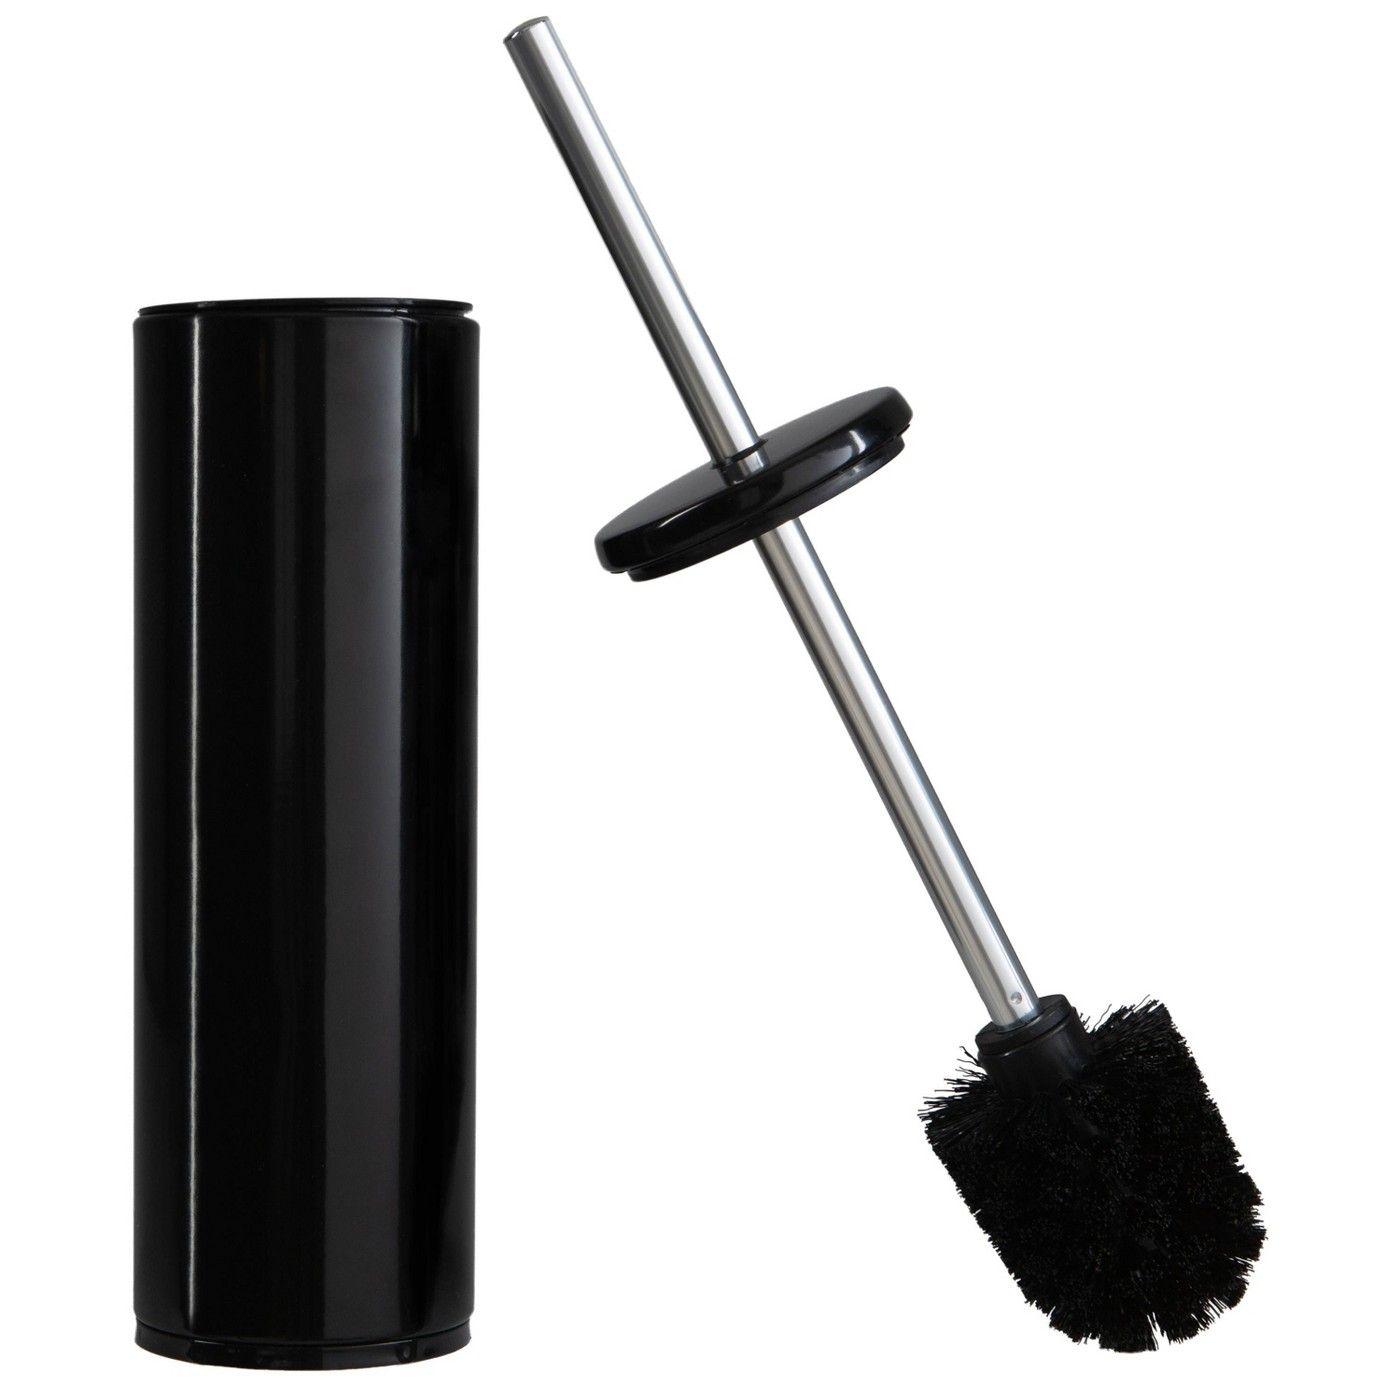 Reinforced Handle//Nylon Bristles White PREMIUM Toilet Bowl Brush /& Holder Set